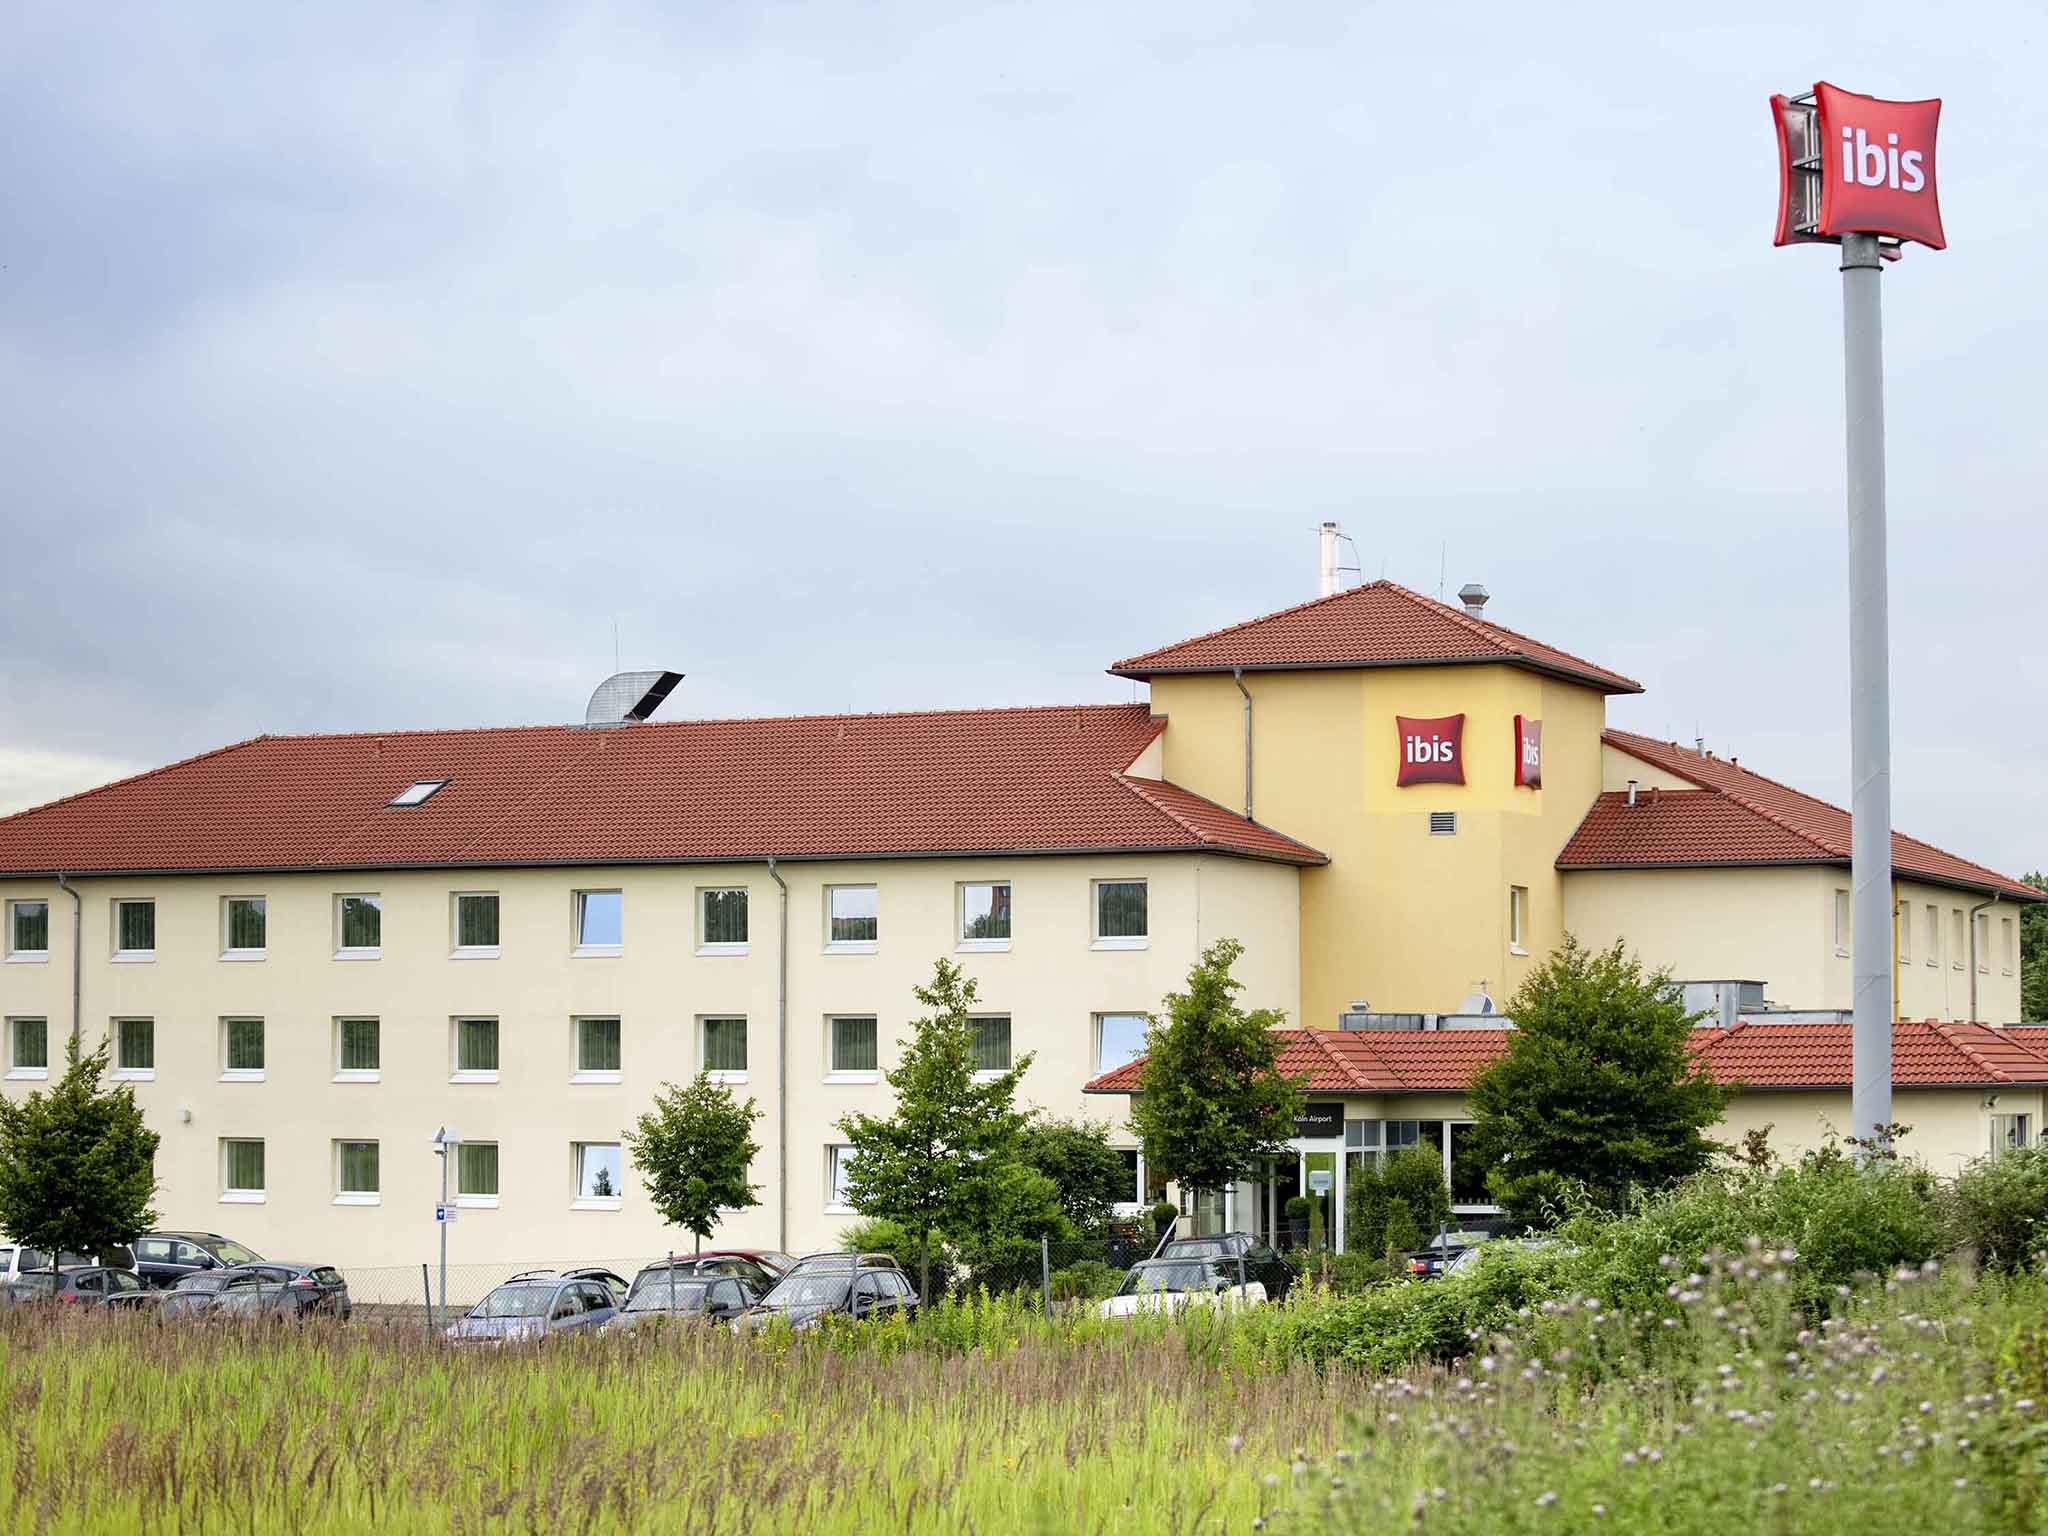 Hotel – ibis Koeln Airport